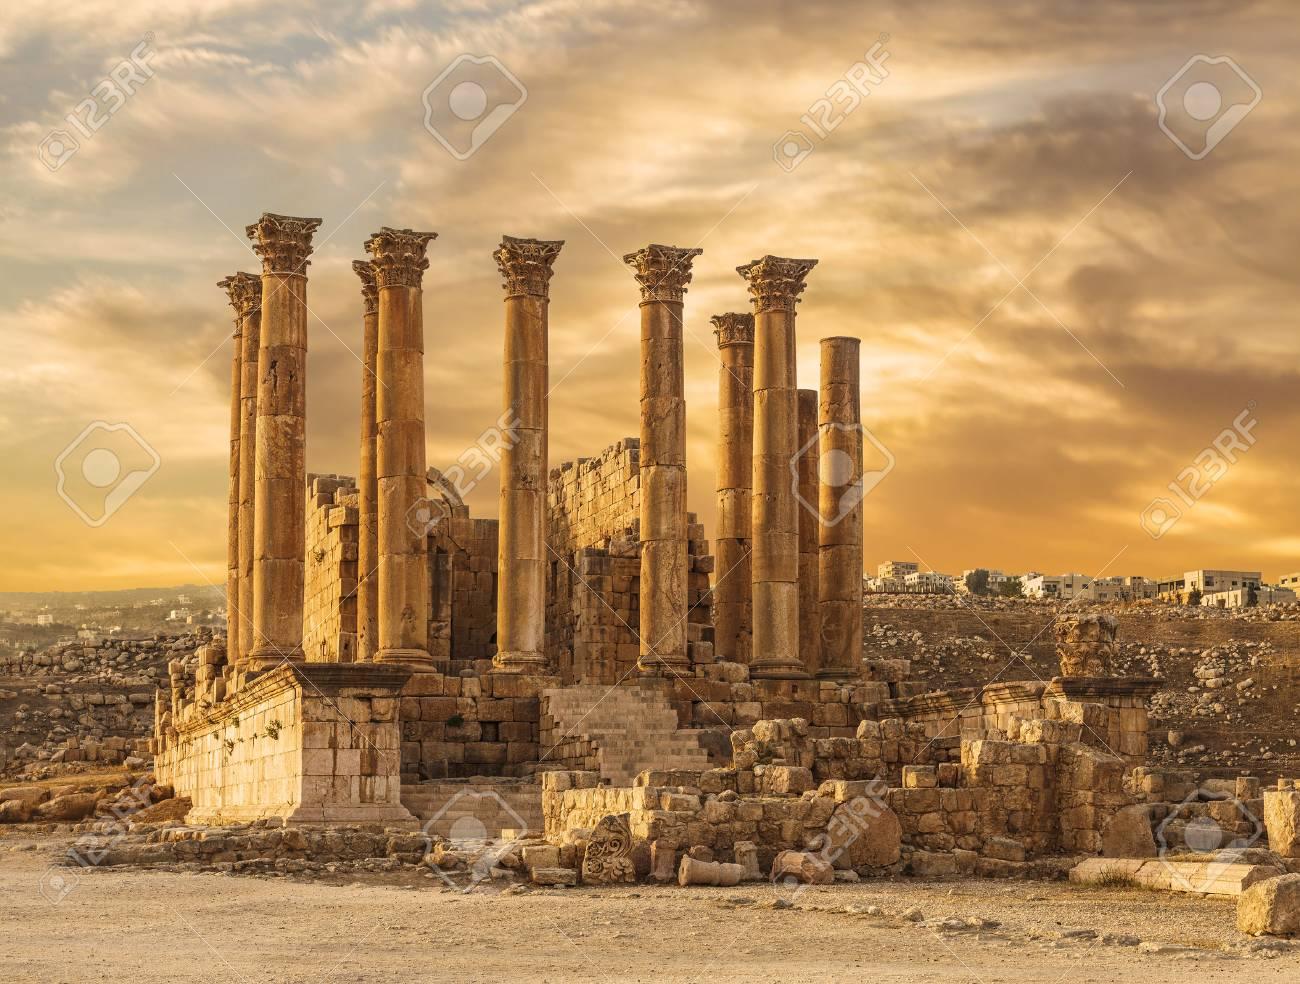 Temple of Artemis in the ancient Roman city of Gerasa at the sunset, preset-day Jerash, Jordan - 70815485